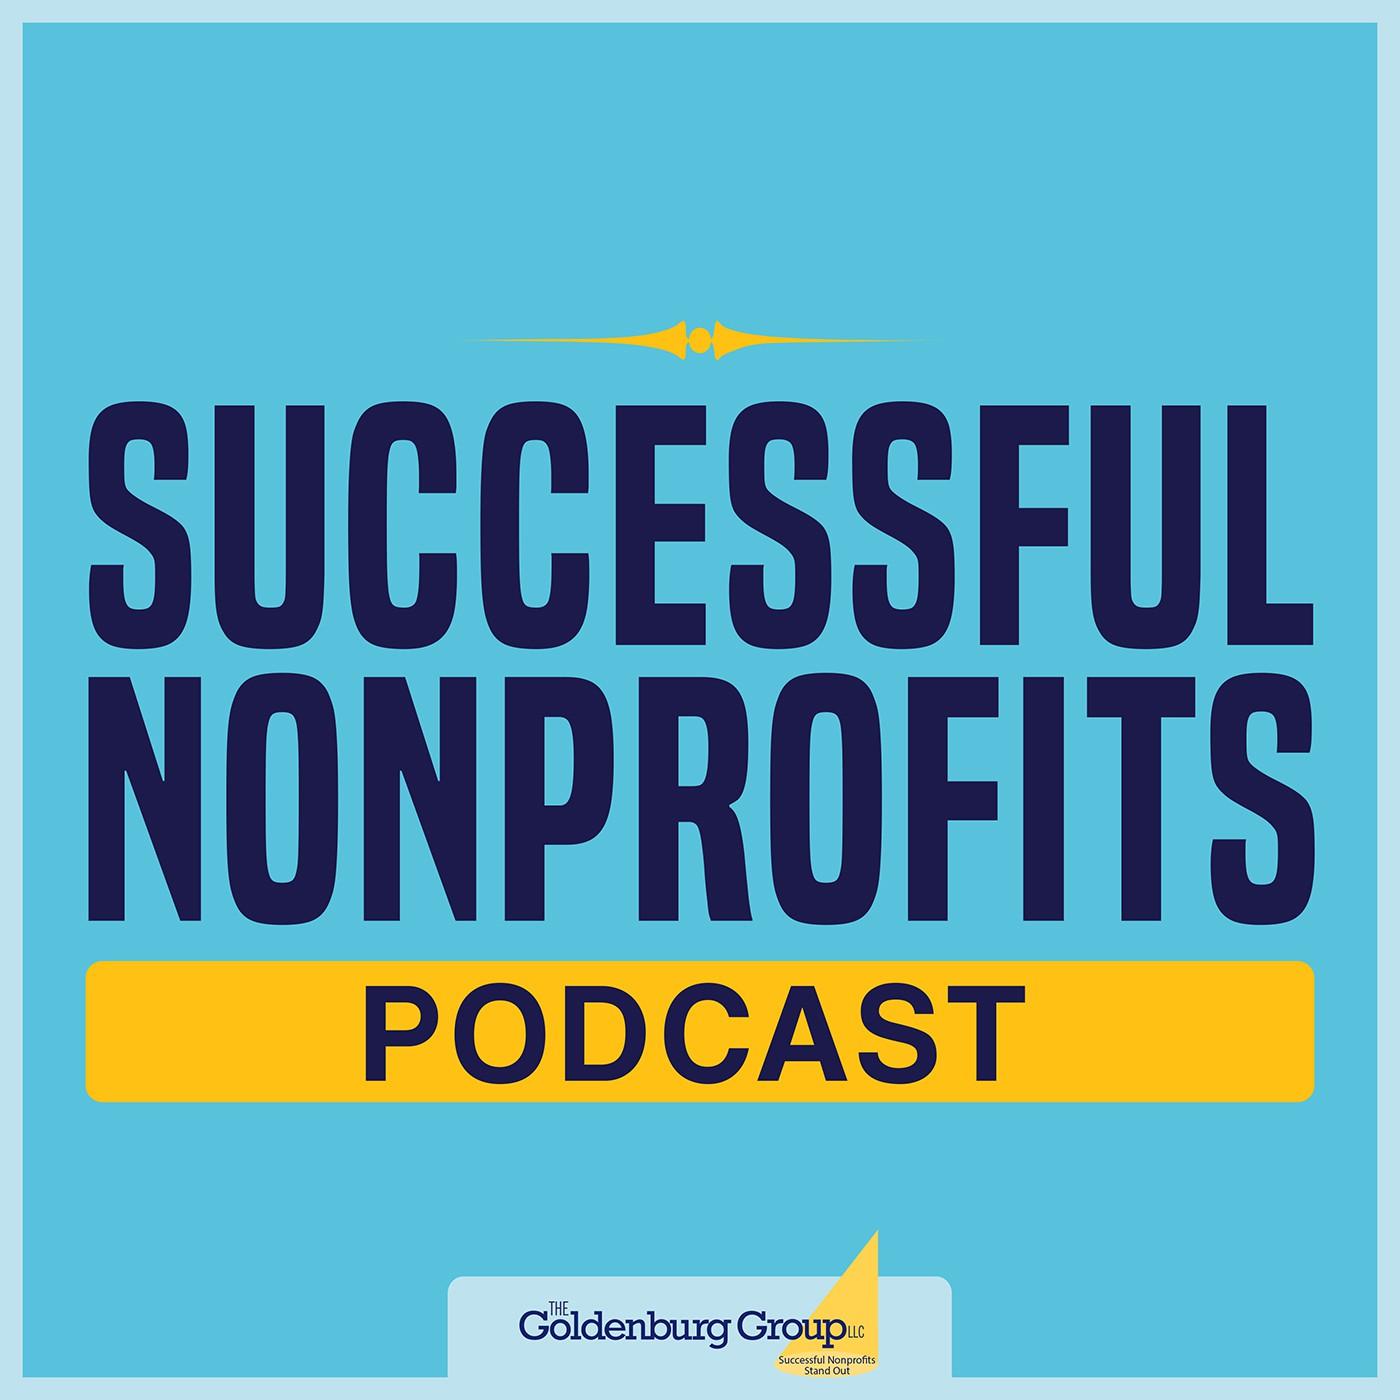 Successful Nonprofits Podcast artwork